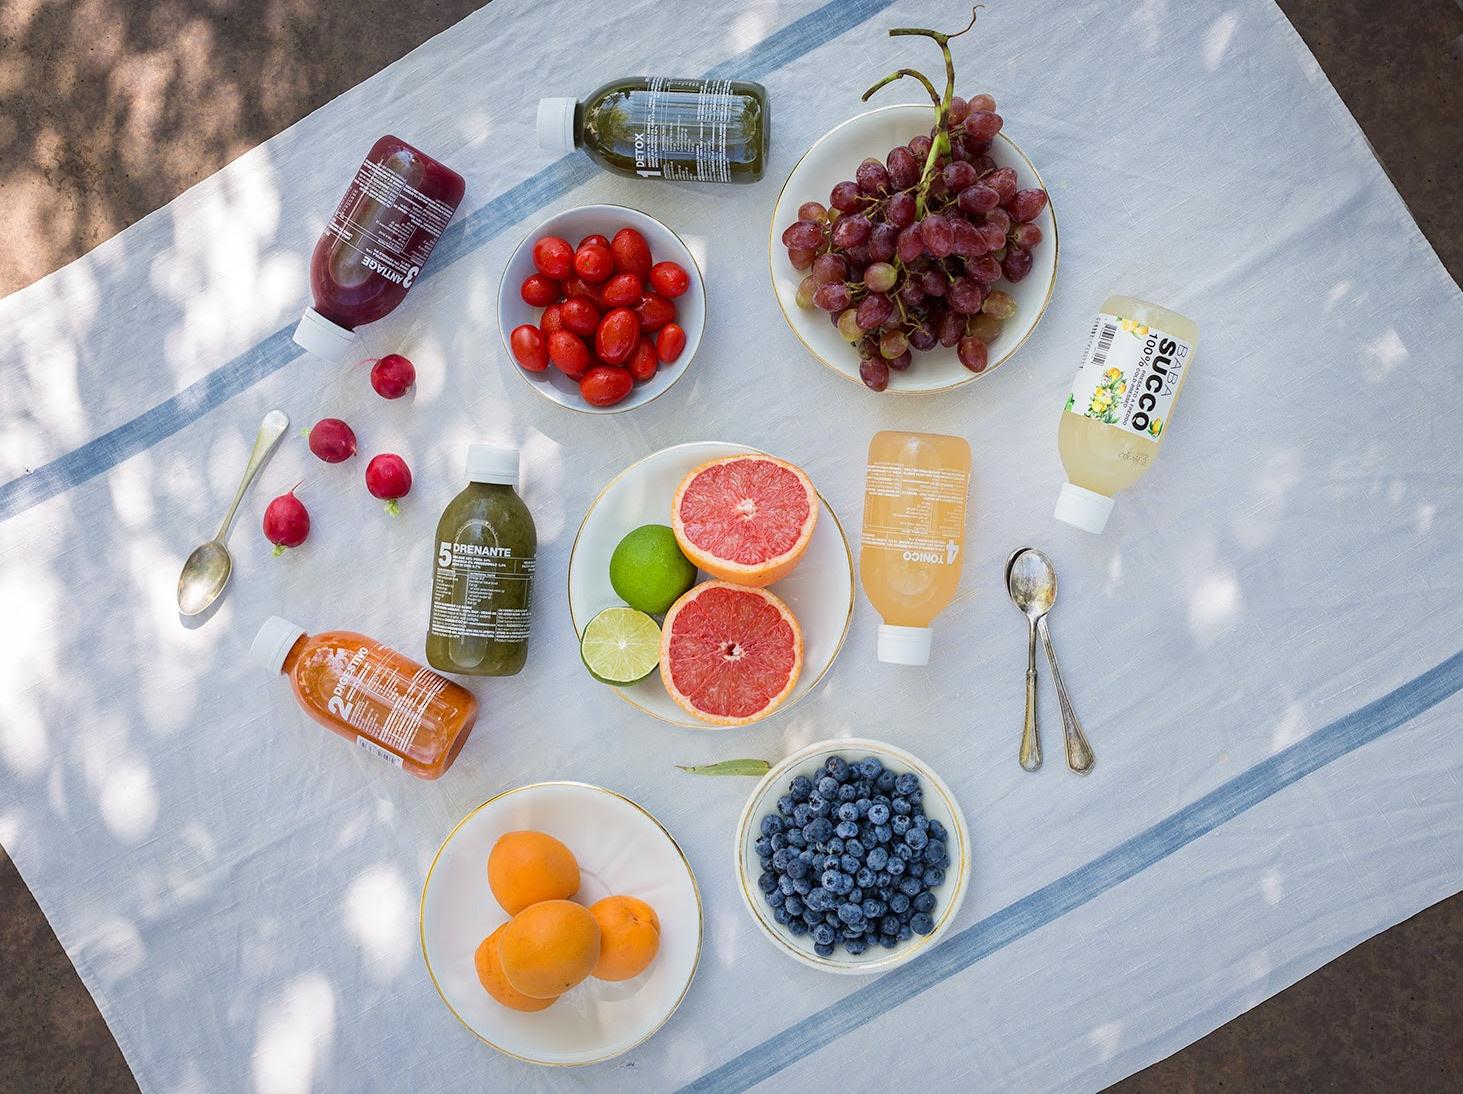 dieta liquida trattamento detox babasucco